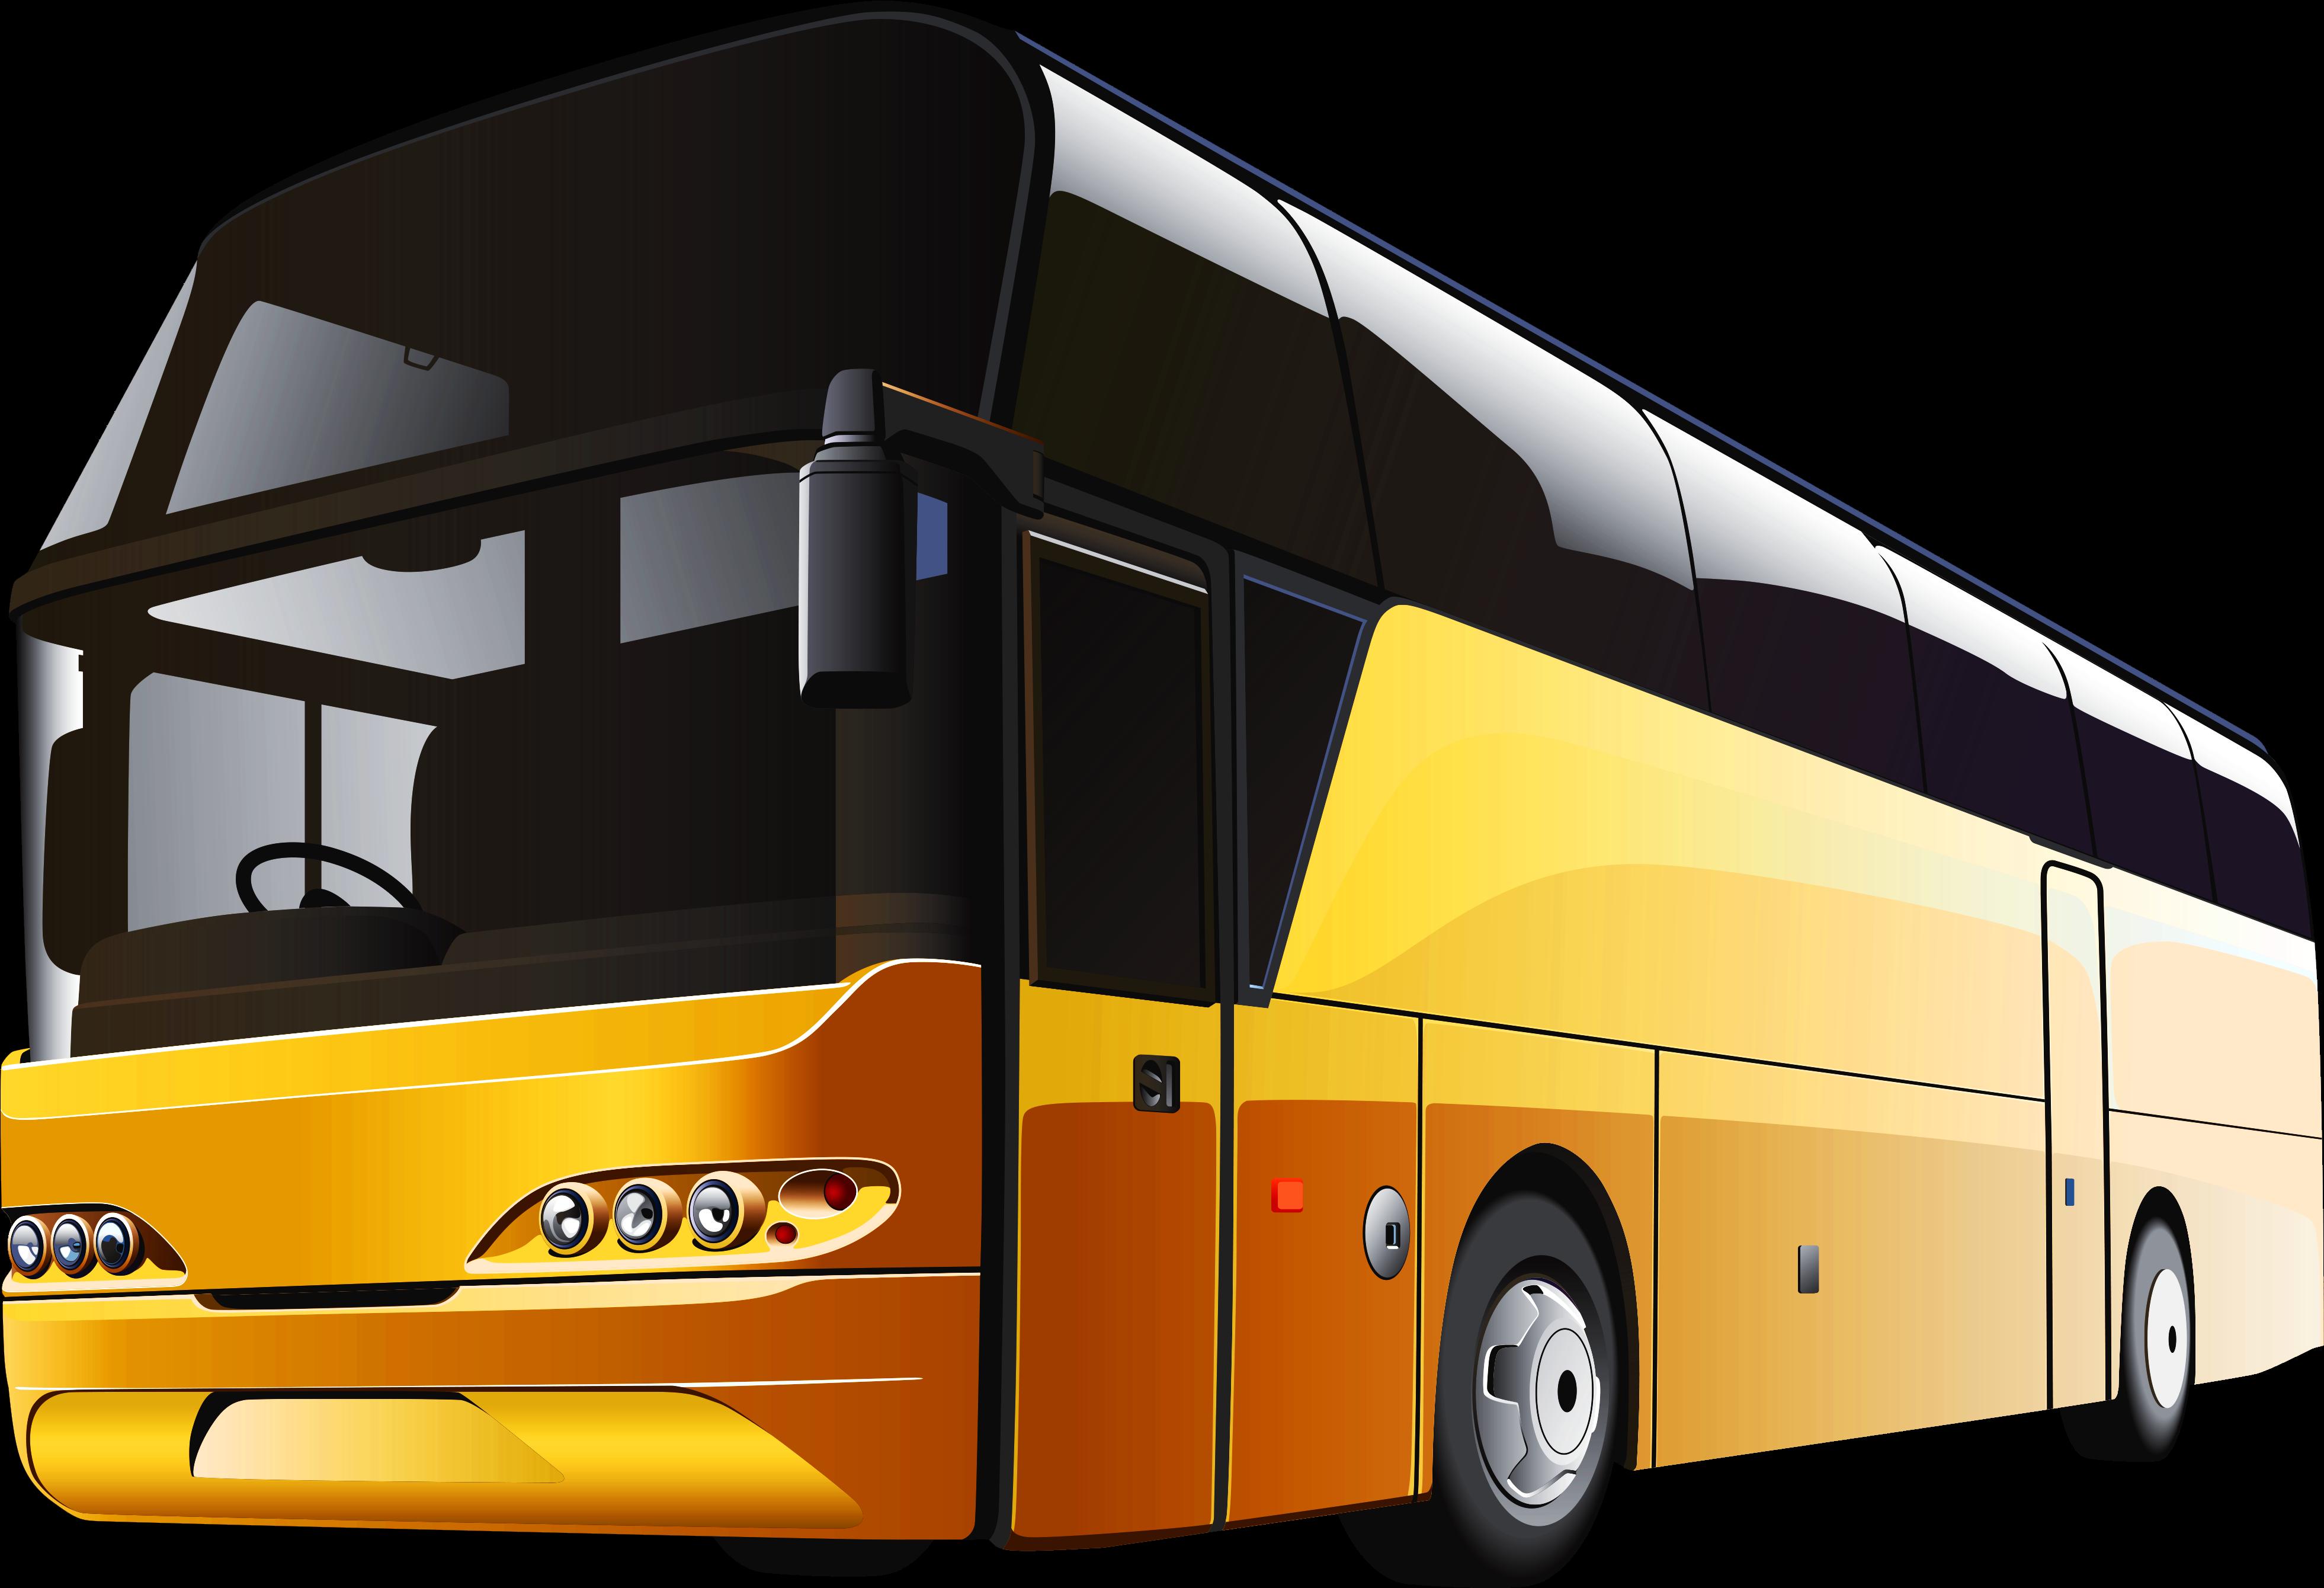 Картинки на автобусы